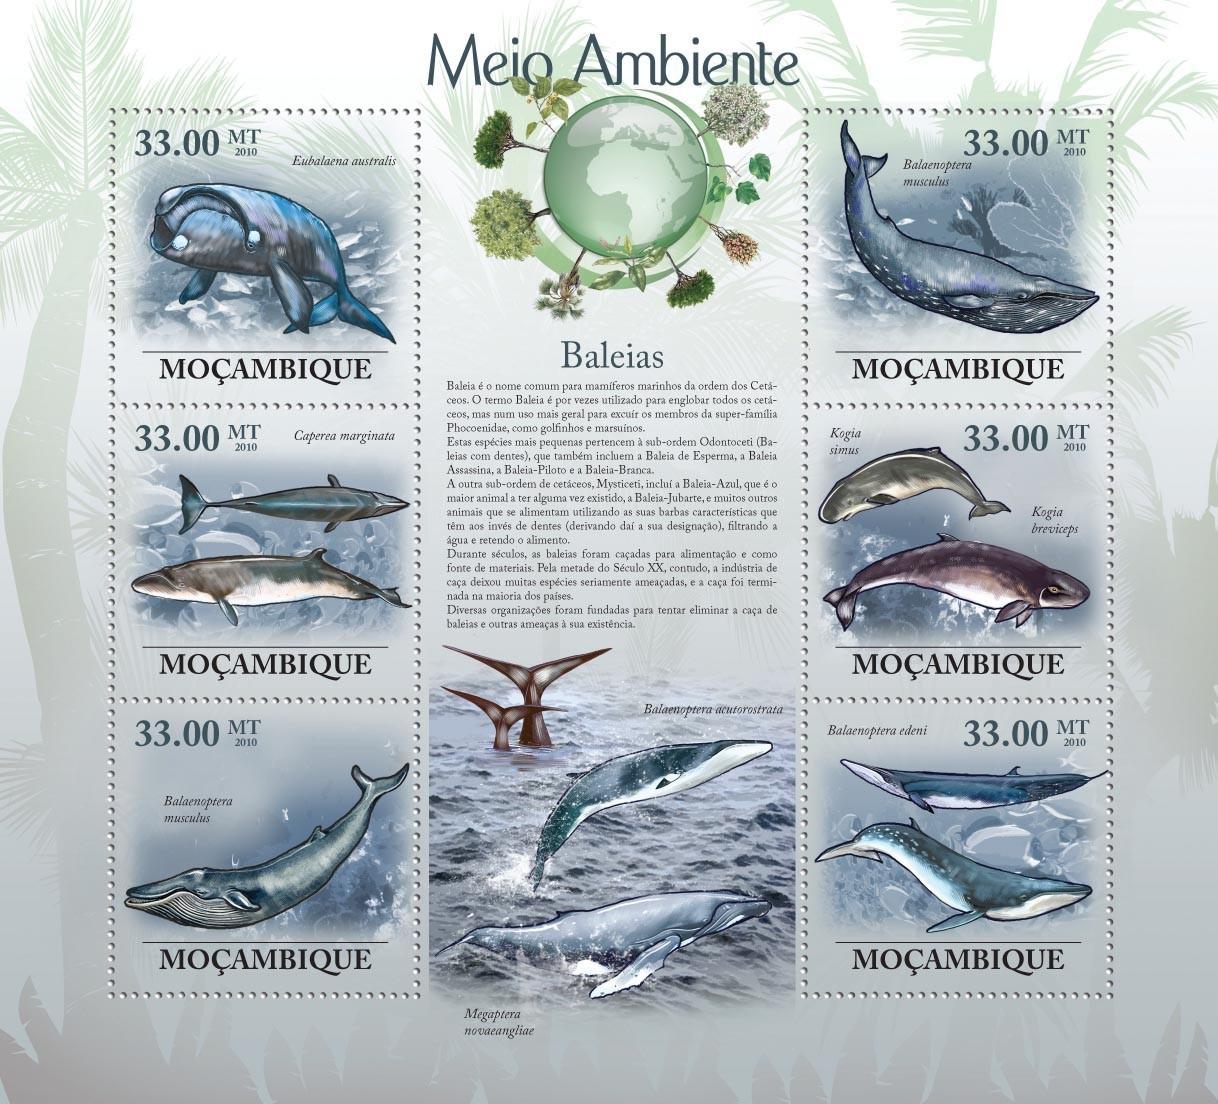 Whales ( Eubalaena australis, Caperea marginata, Balaenoptera musculus, etc..) - Issue of Mozambique postage Stamps